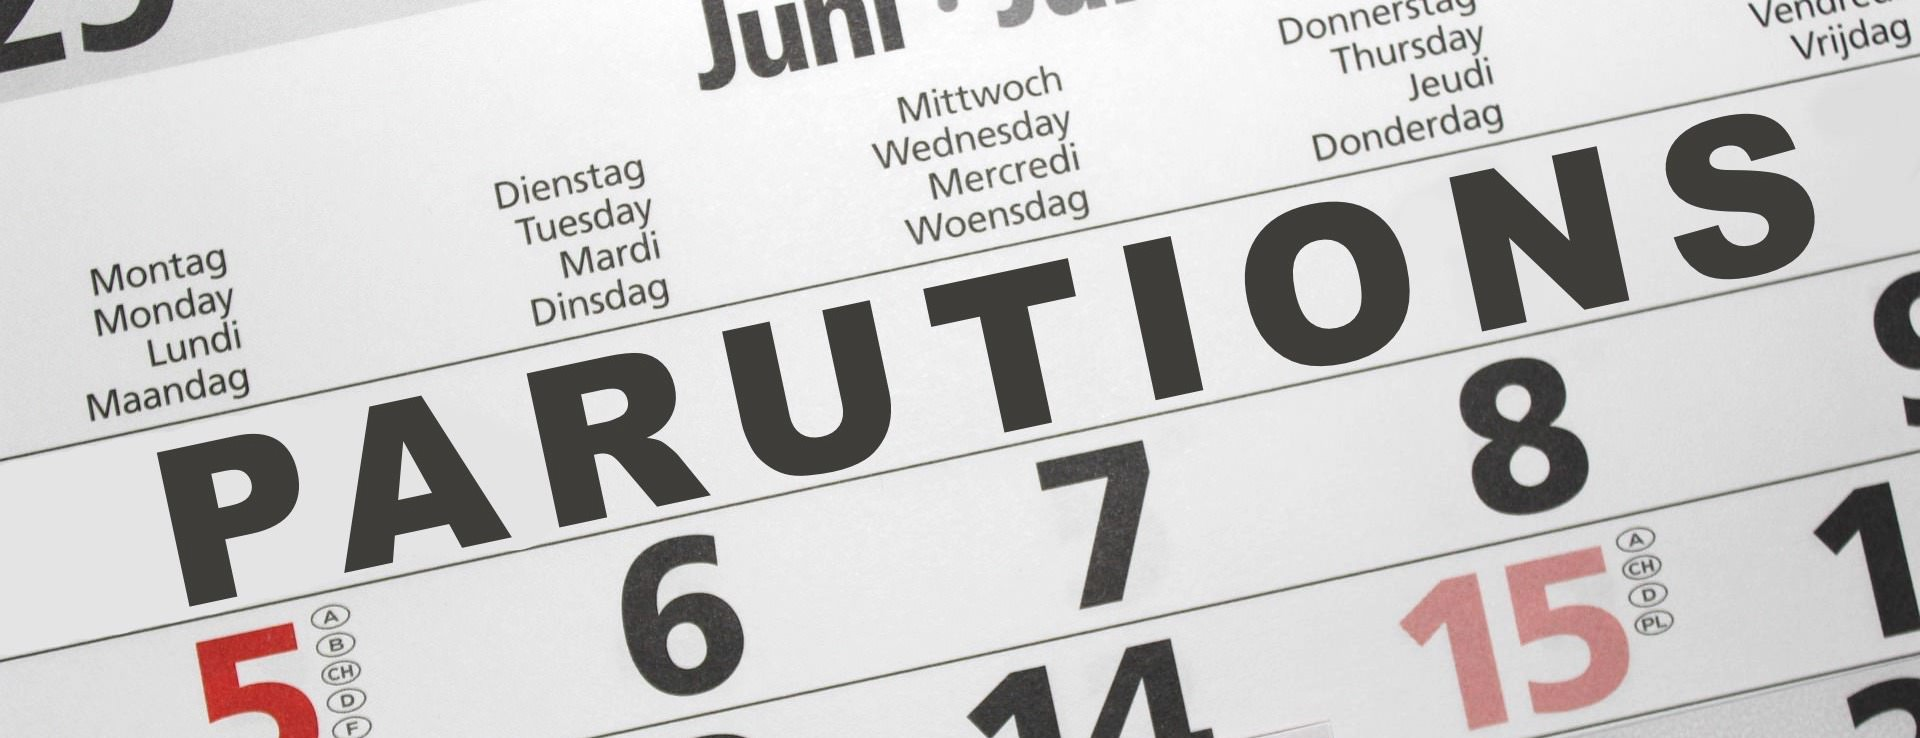 Parution - date - agenda